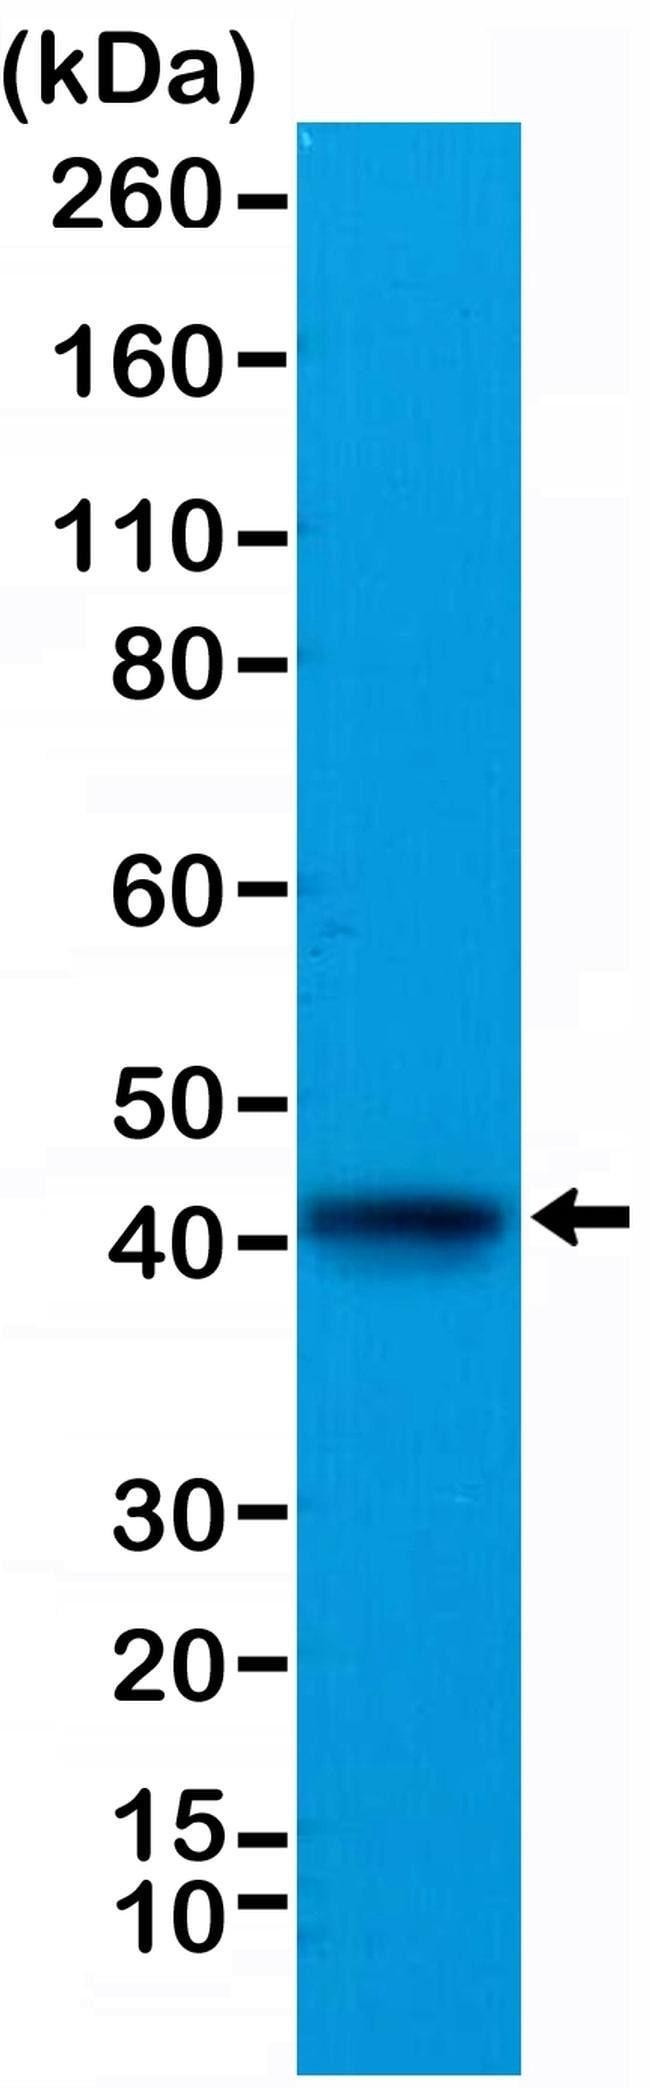 ACTC1 Rabbit anti-Bovine, Human, Mouse, Rat, Invitrogen 100 µL; Unconjugated